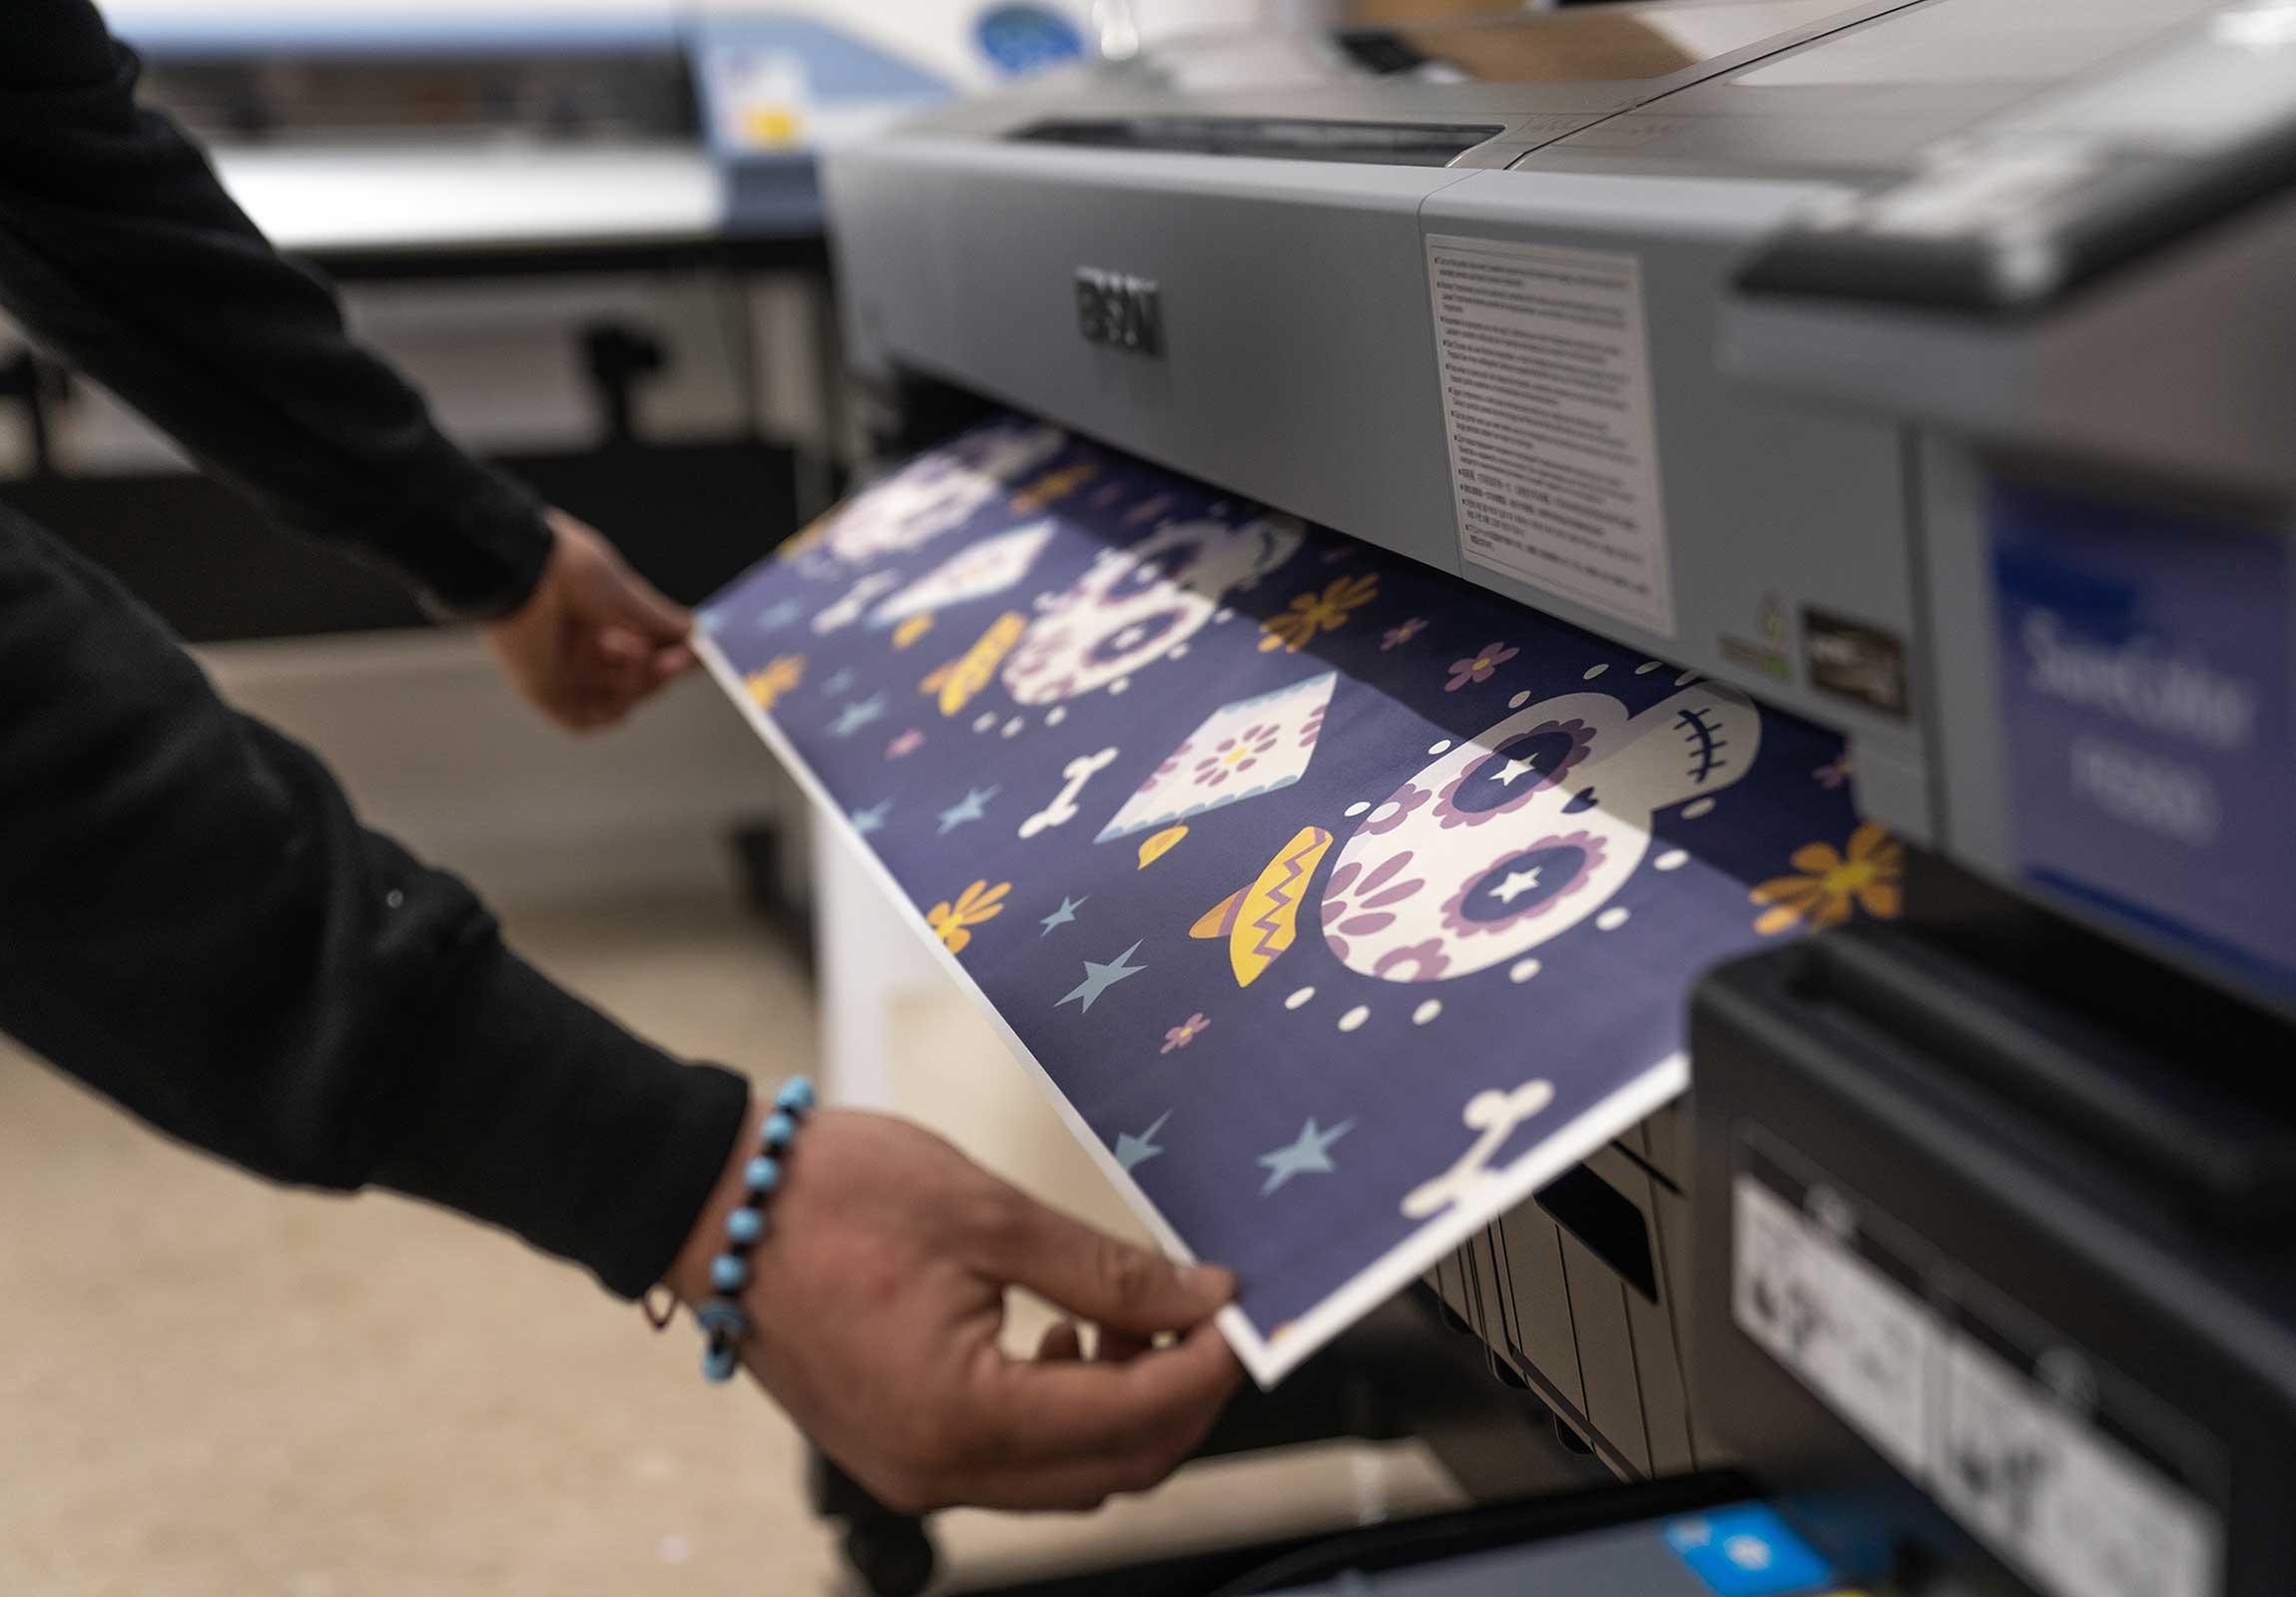 Stampa digitale Serigrafia Ricamo